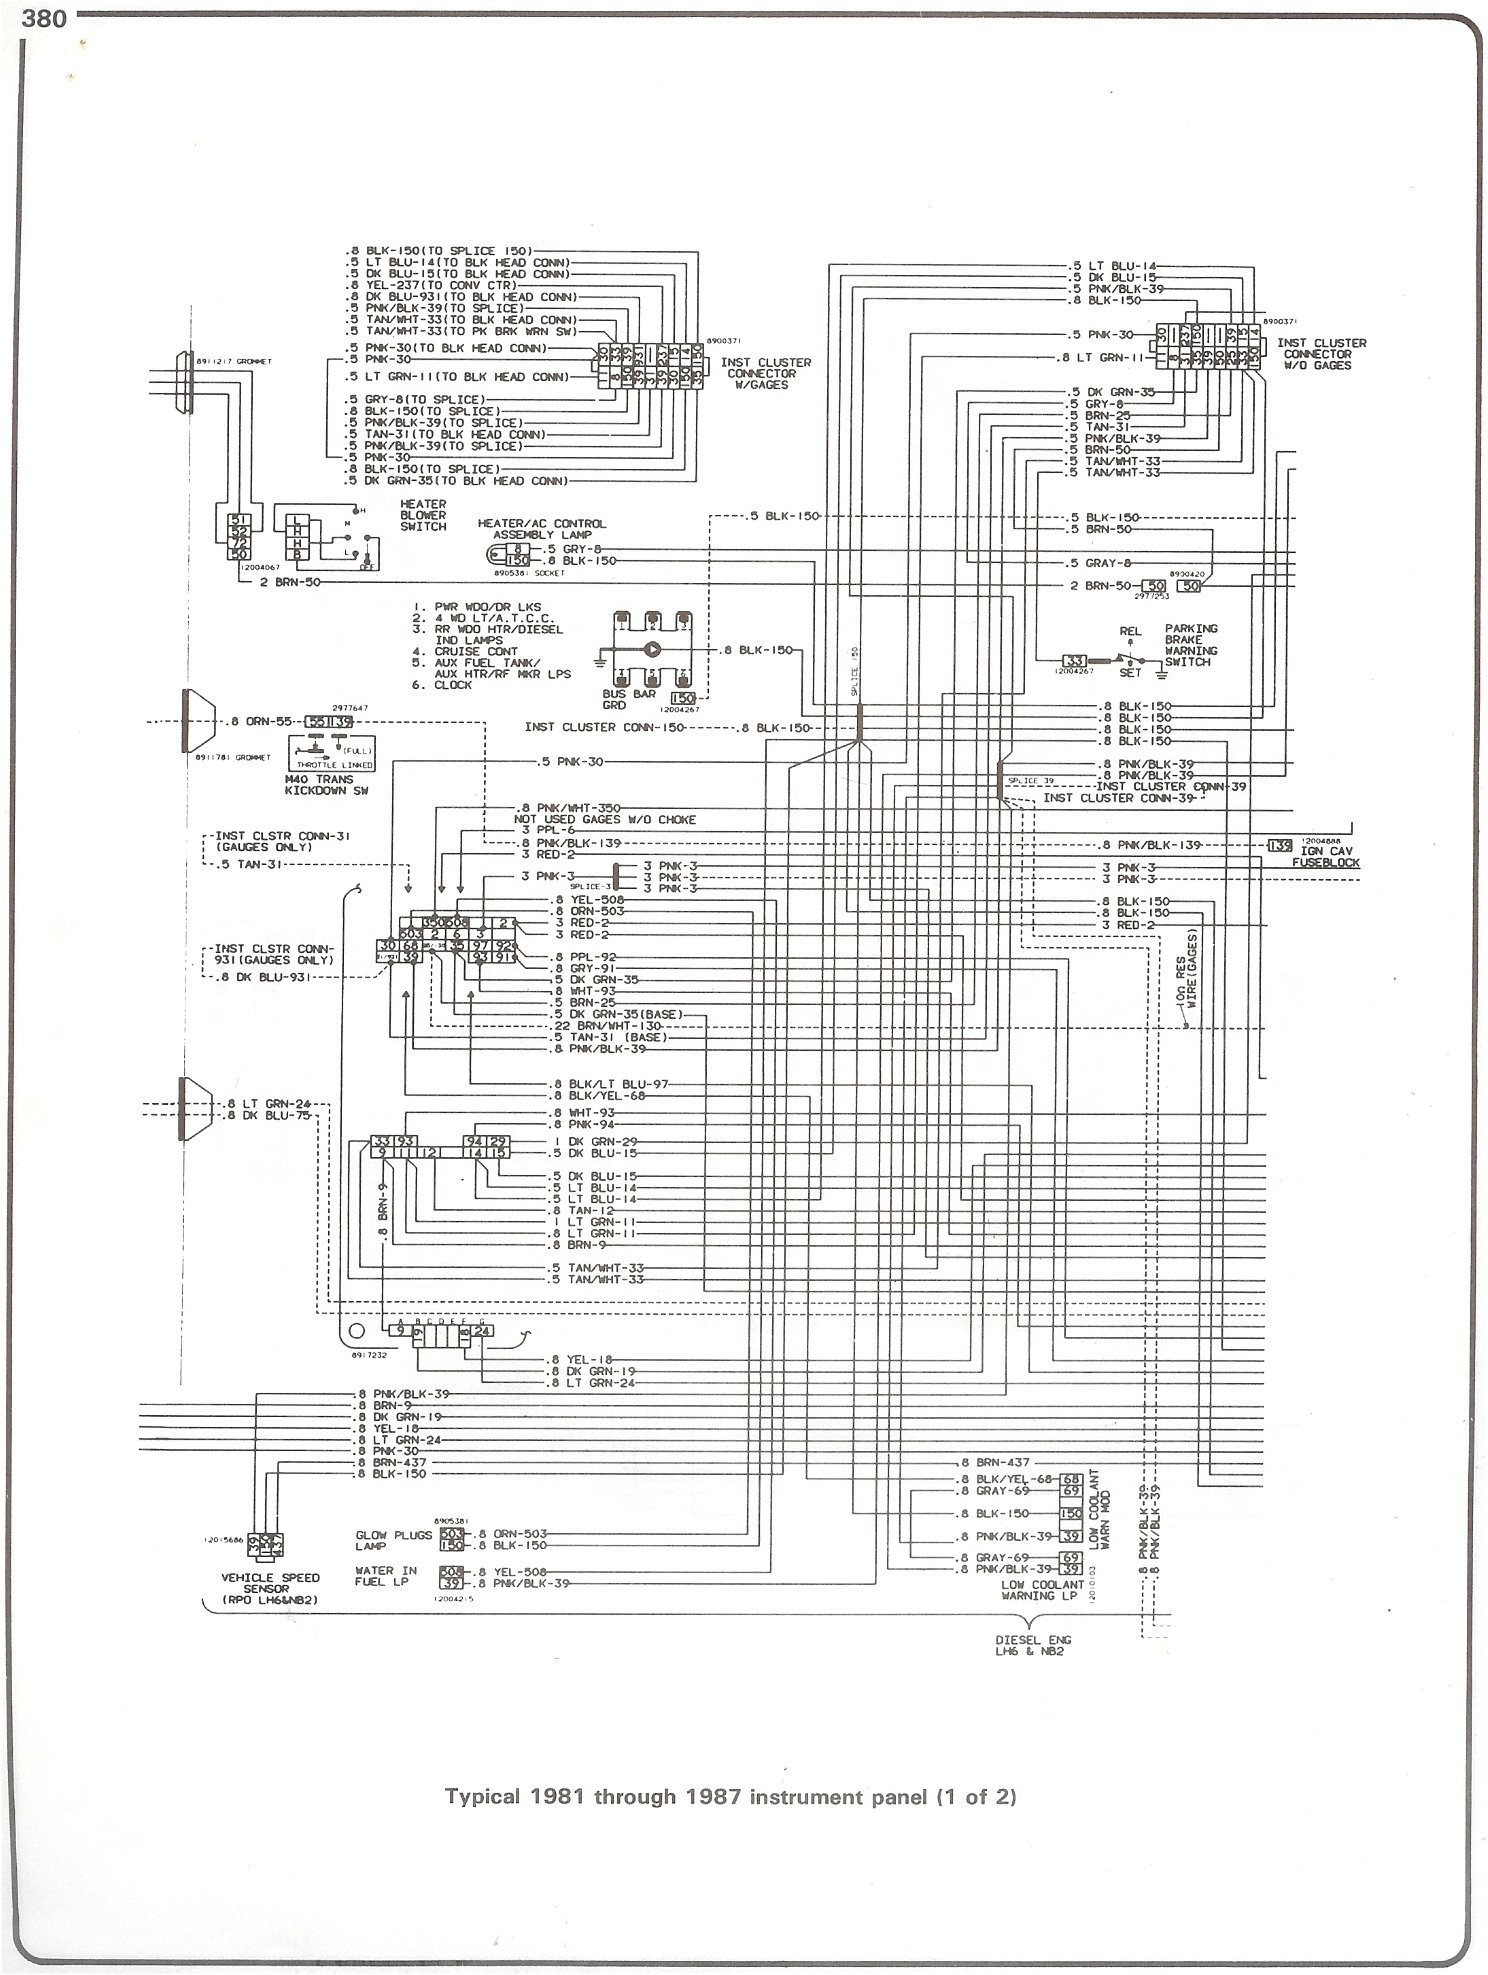 Truck Engine Diagram Chevrolet P30 Wiring Diagram Get Free Image About Wiring Diagram Of Truck Engine Diagram